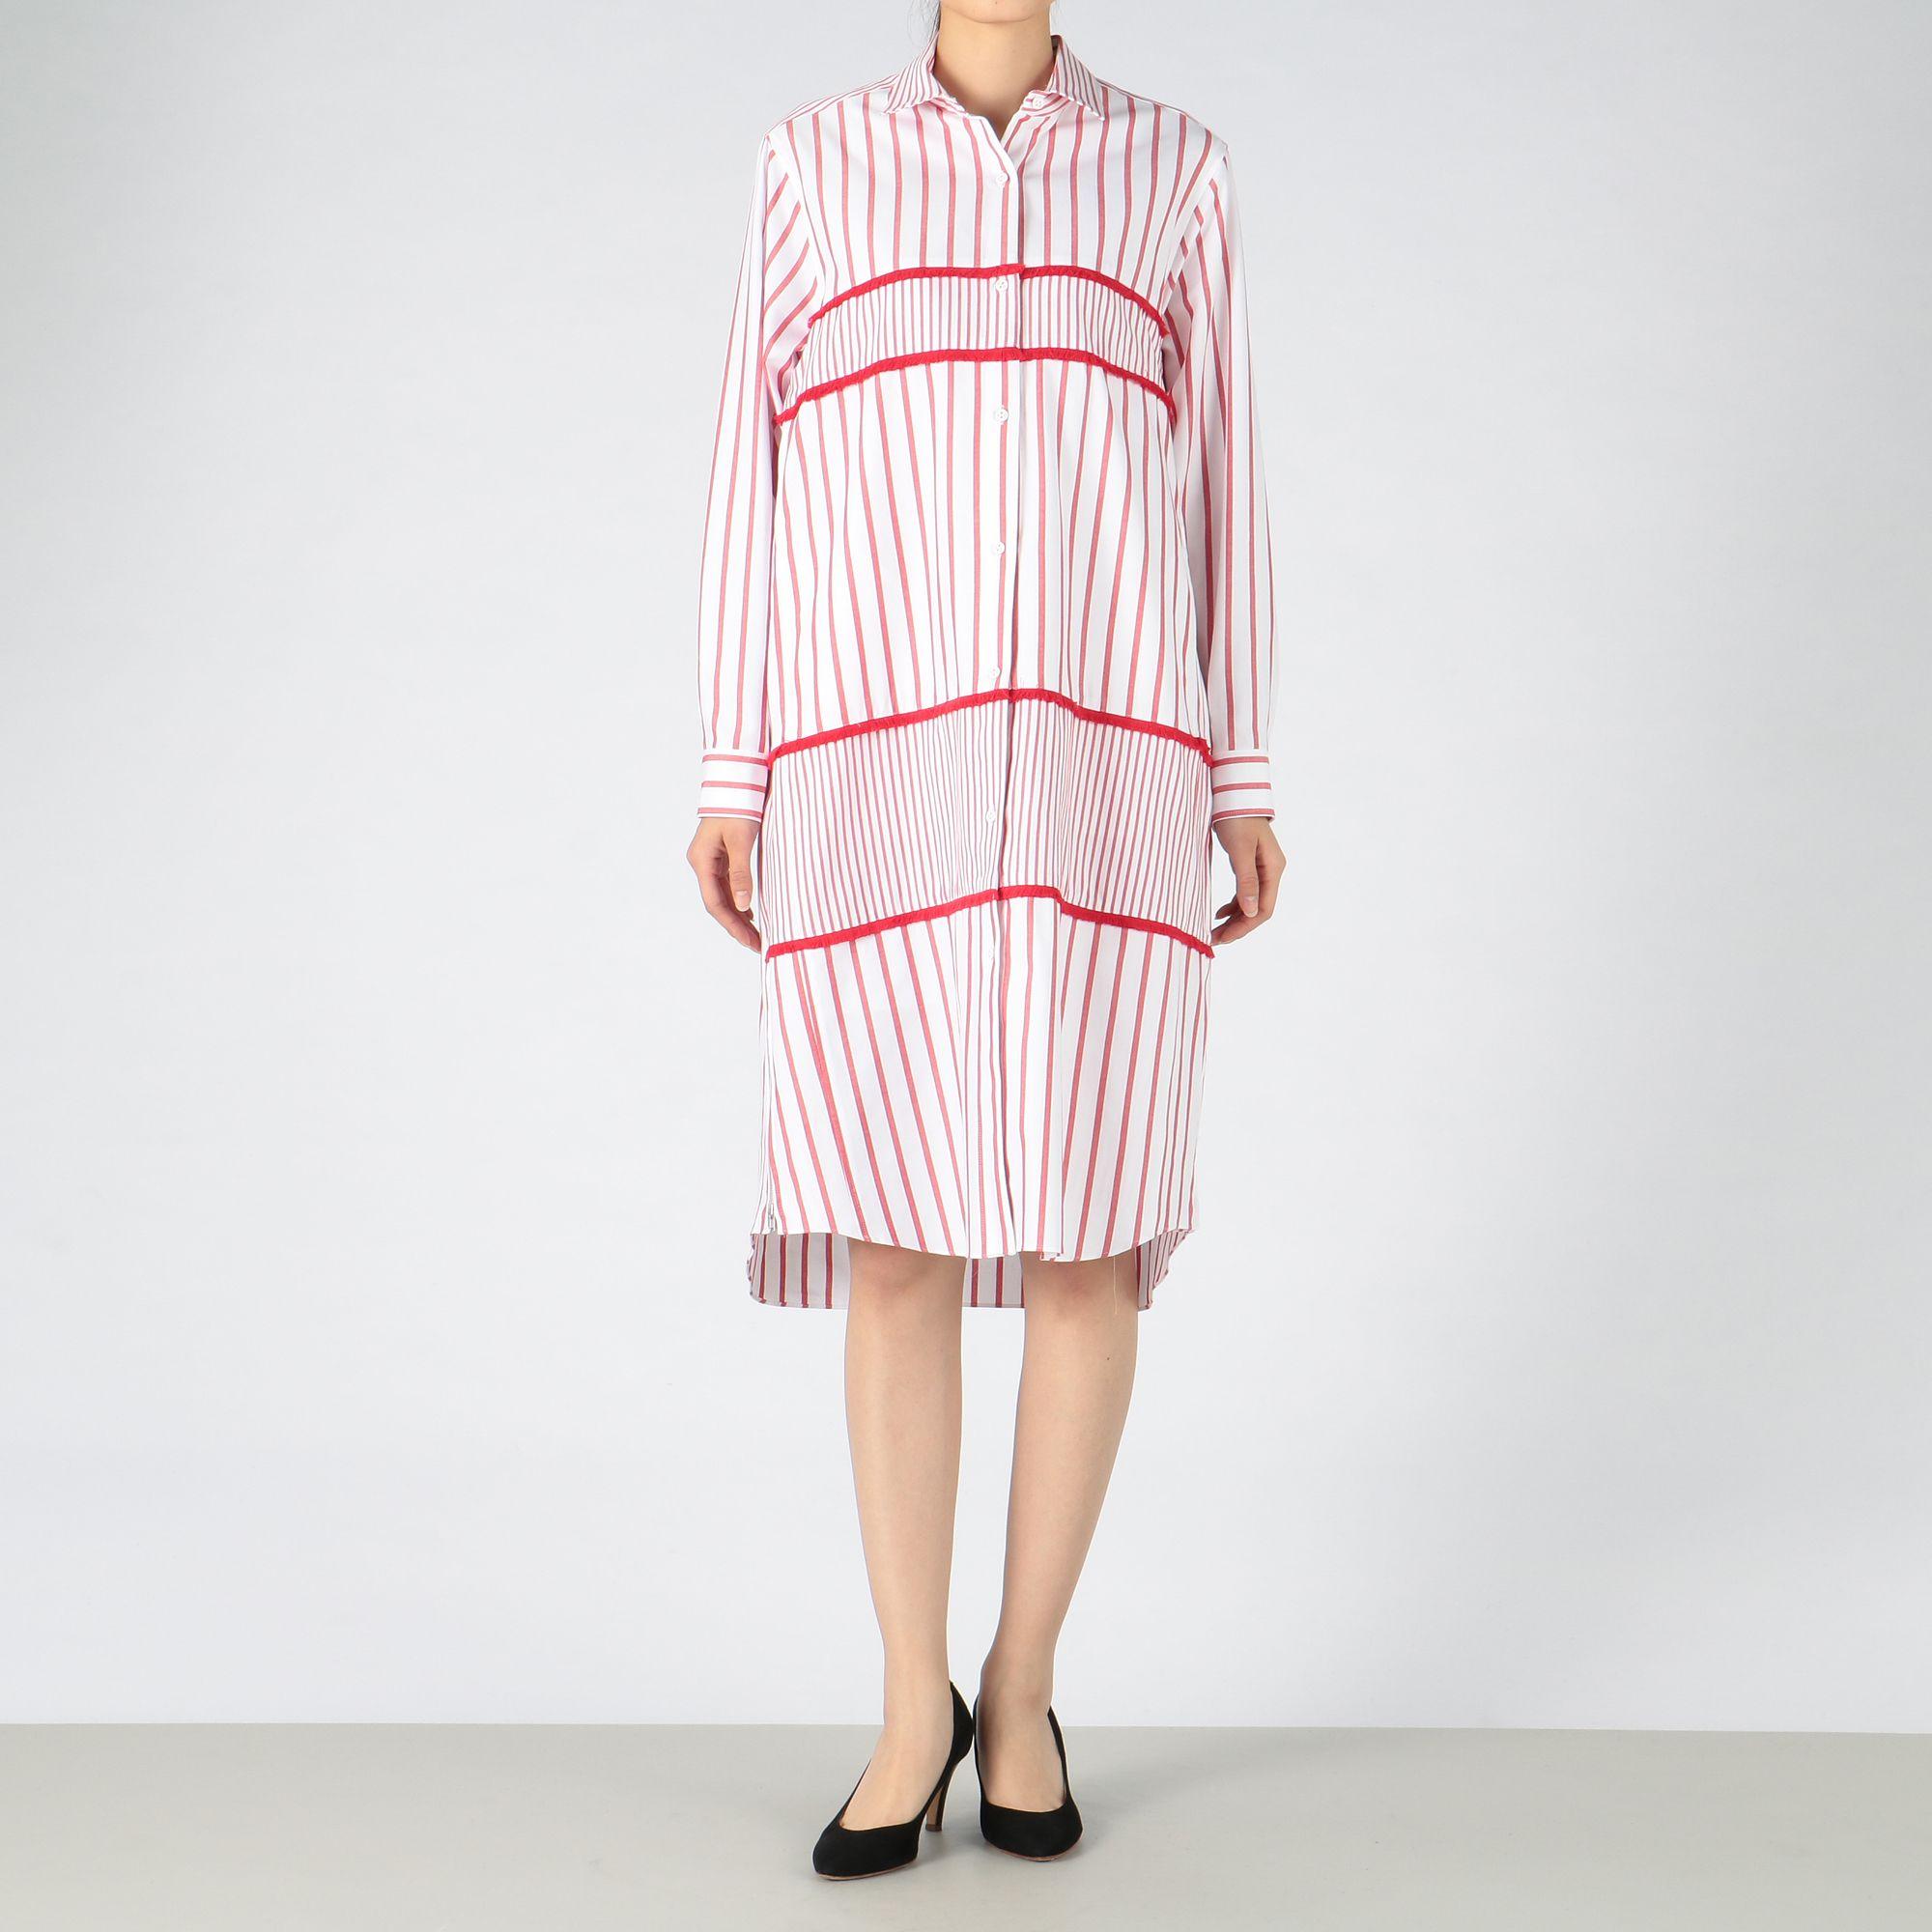 <集英社>【mintdesigns SKETCH】STRIPE SHIRT DRESS画像